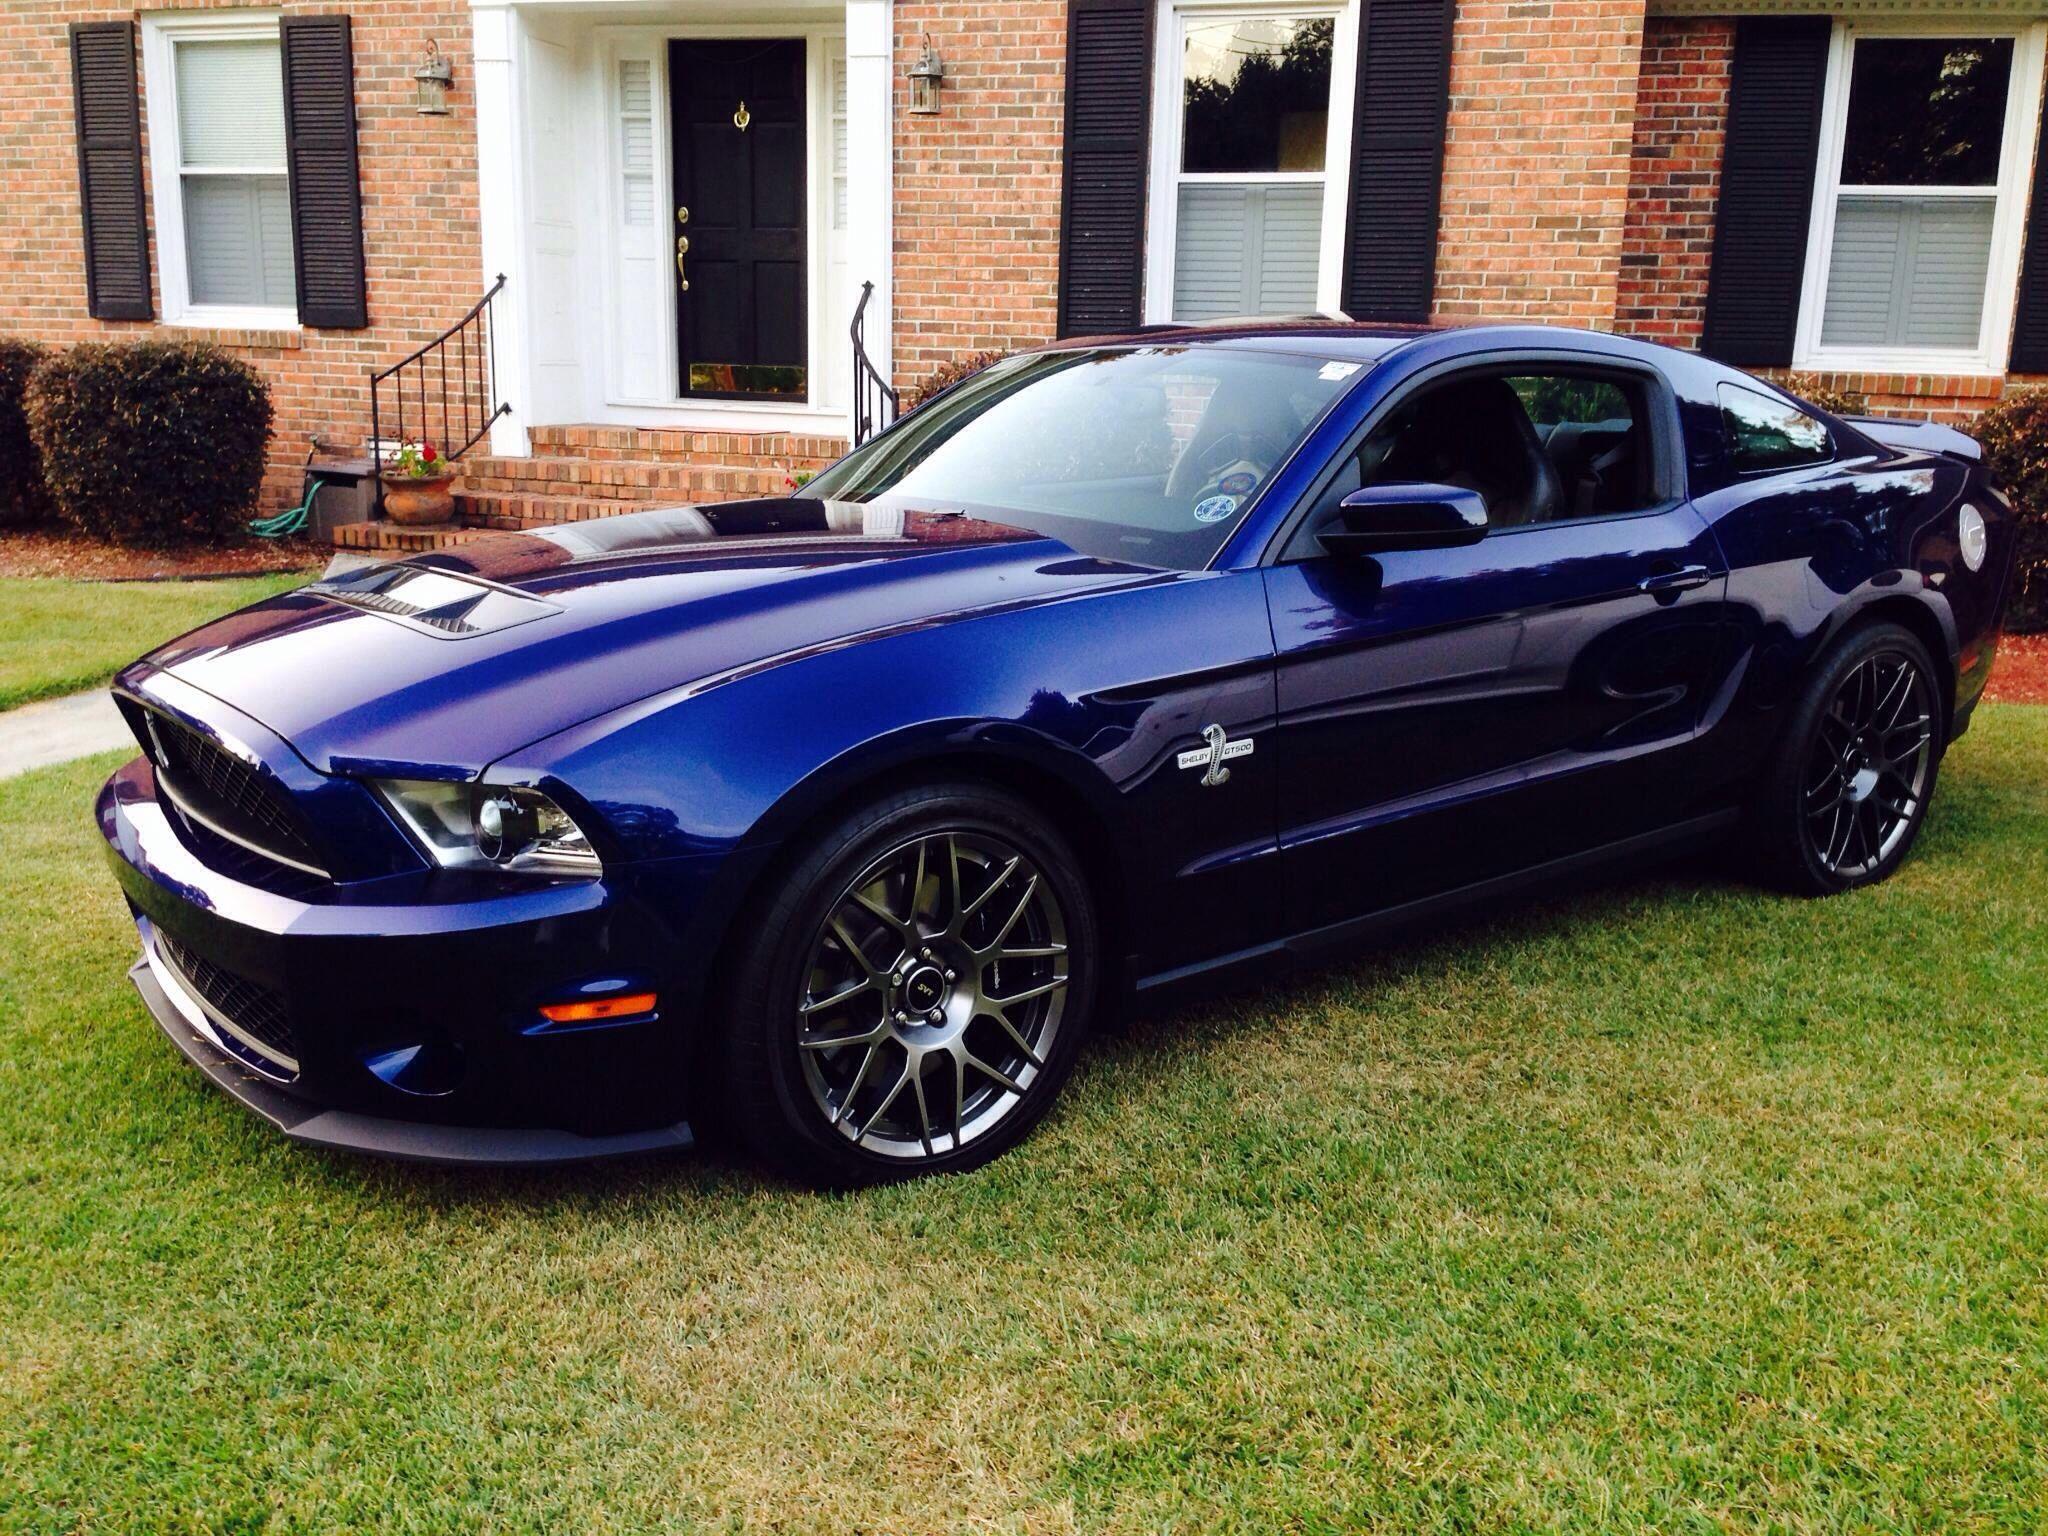 My 2012 Shelby Gt500 In Kona Blue My Mistress